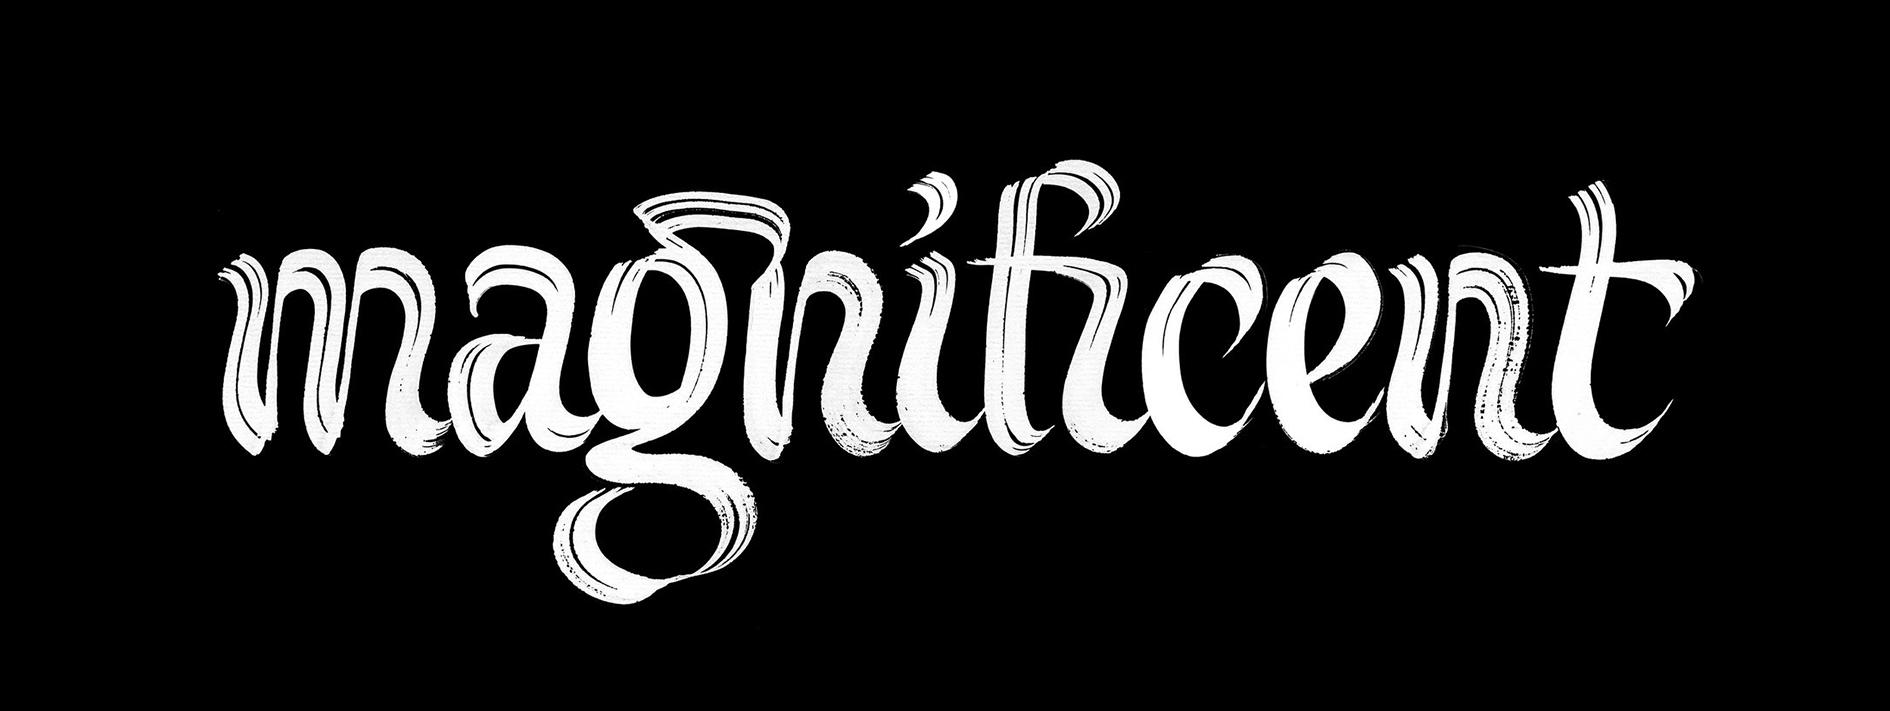 Мagnificent_calligraphy